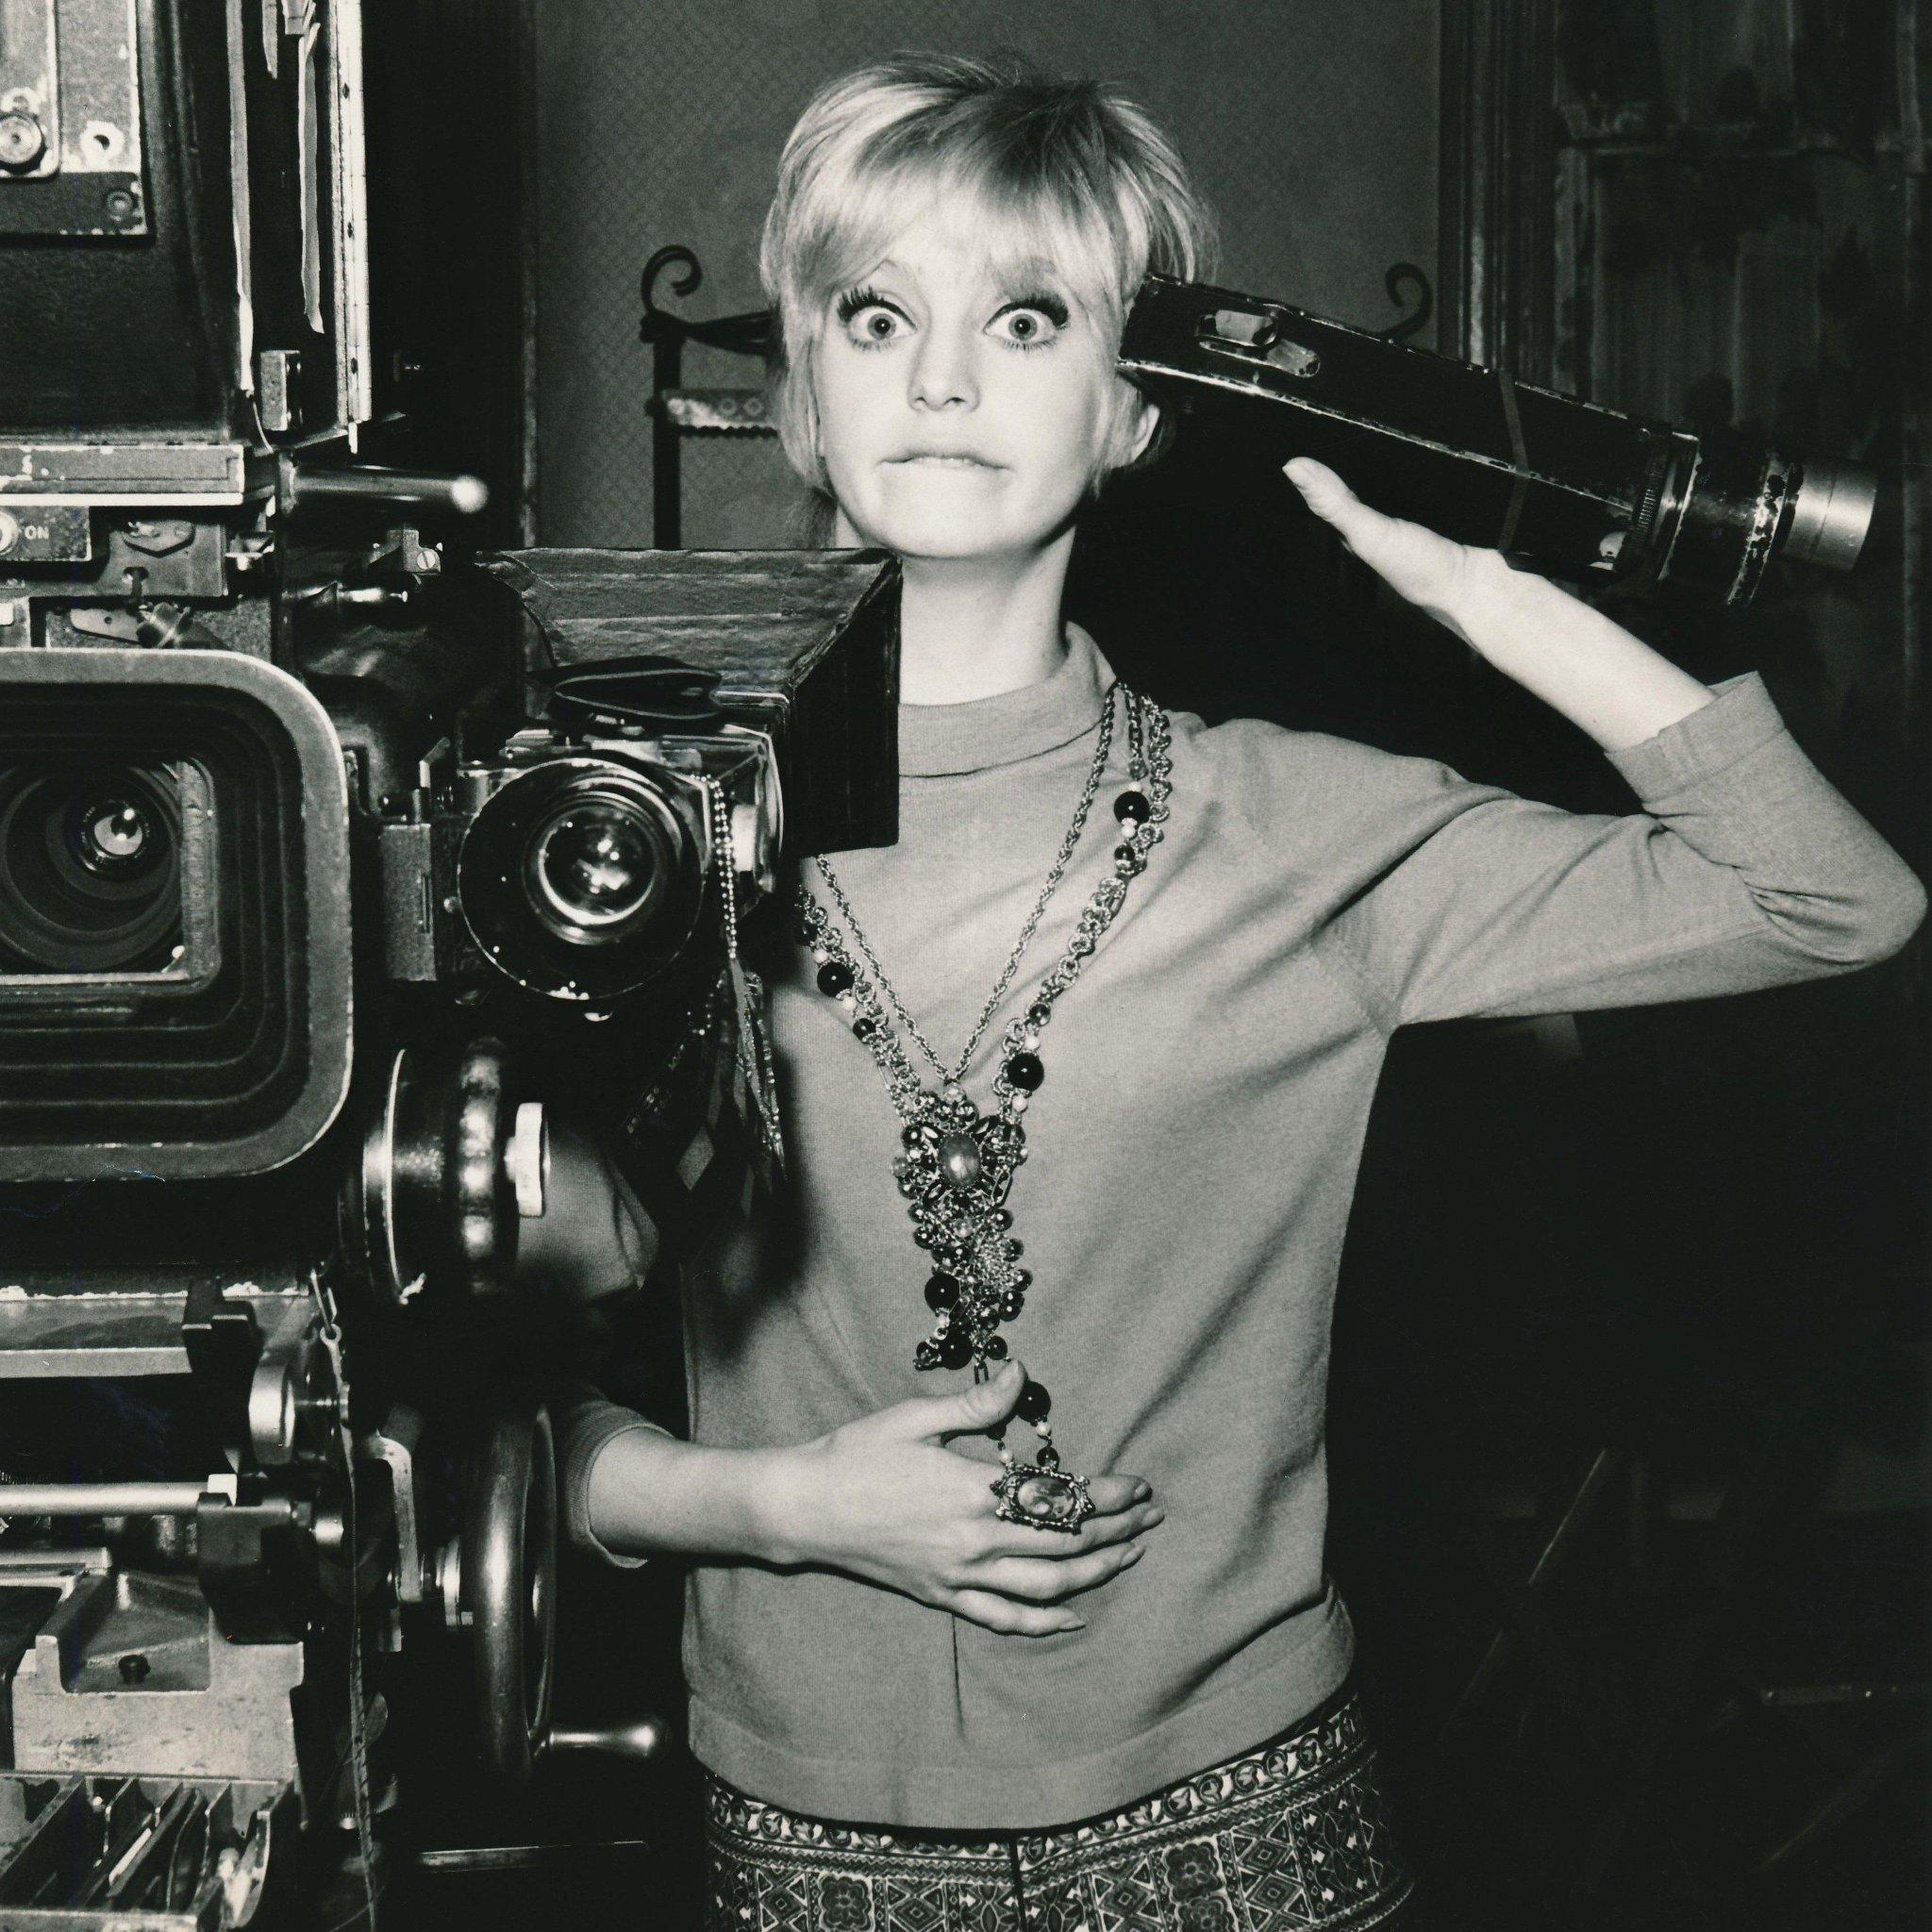 Happy birthday, Goldie Hawn!